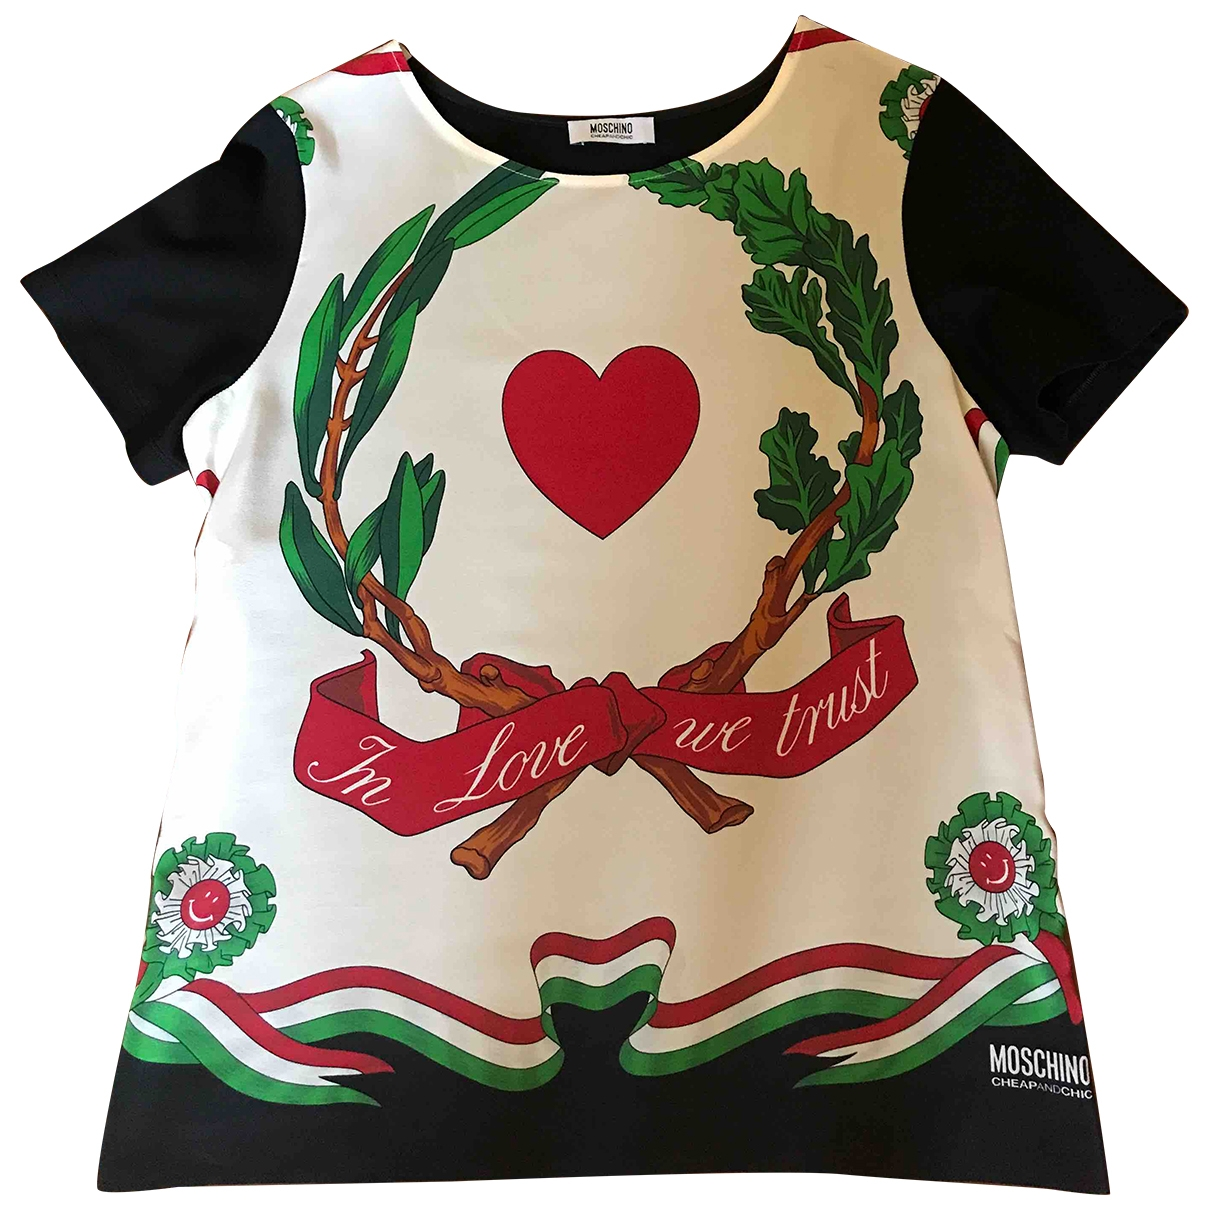 Camiseta de Seda Moschino Cheap And Chic